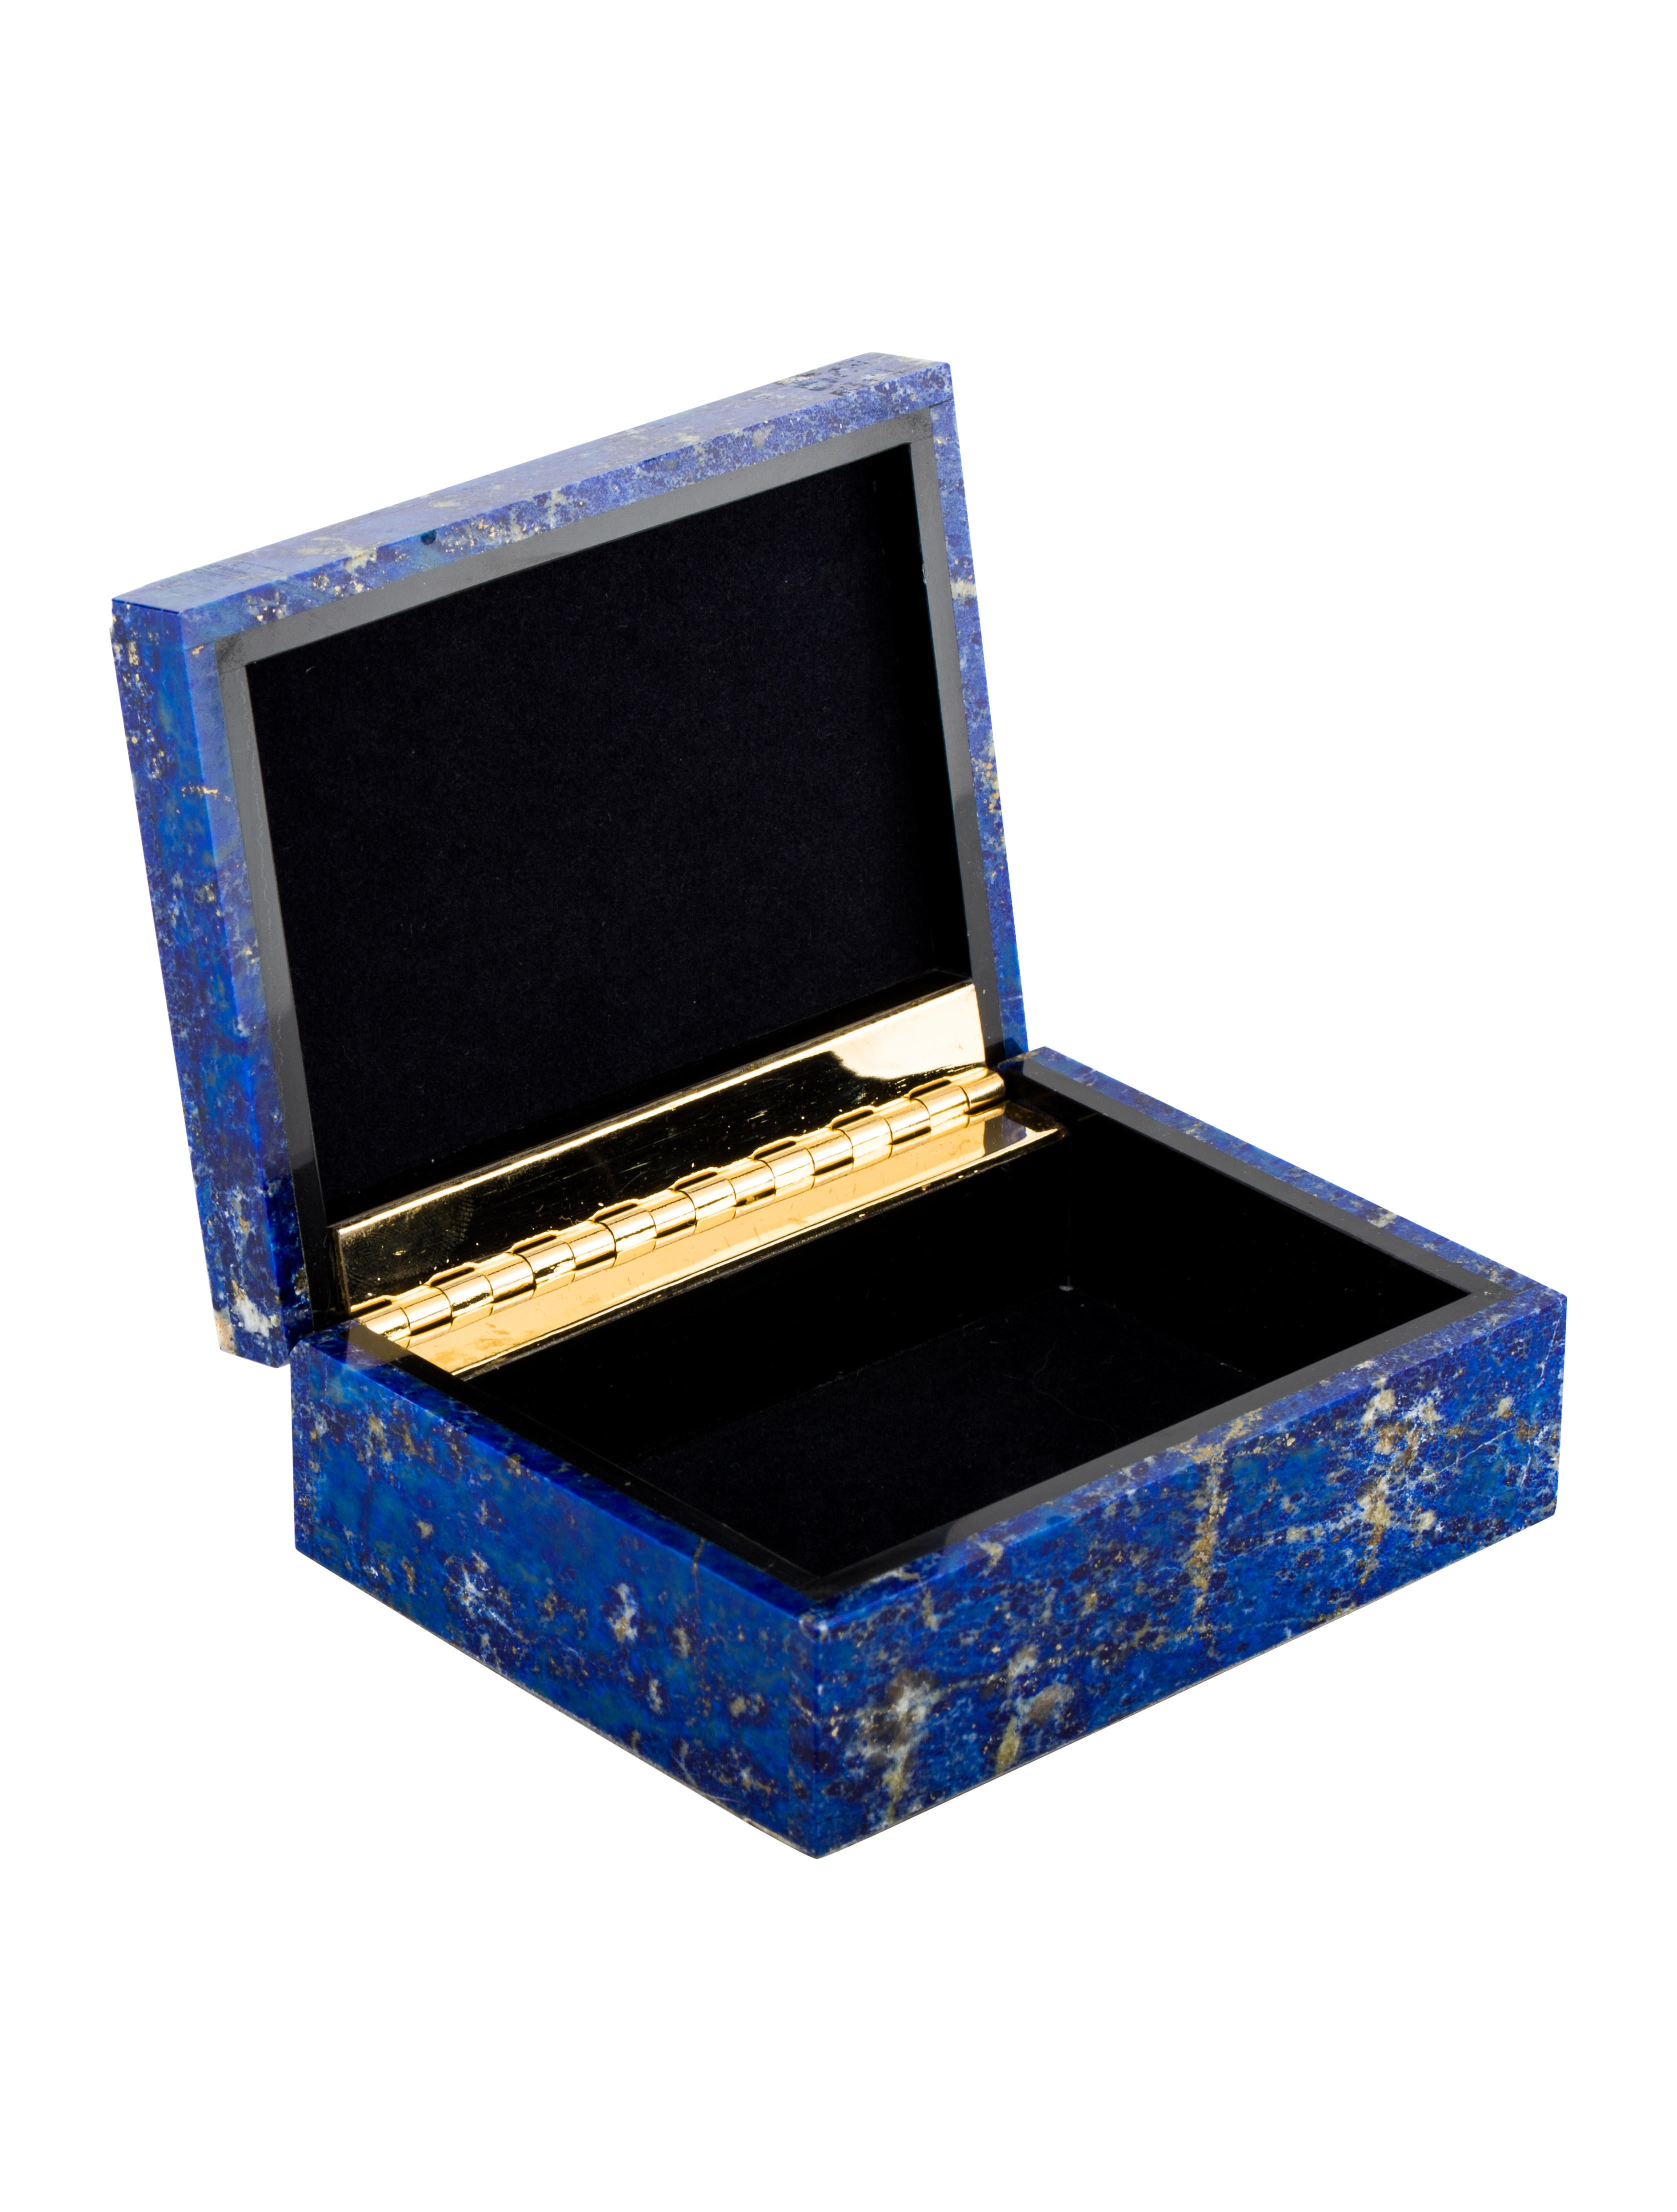 Lapis Lazuli Jewelry Box Decor And Accessories